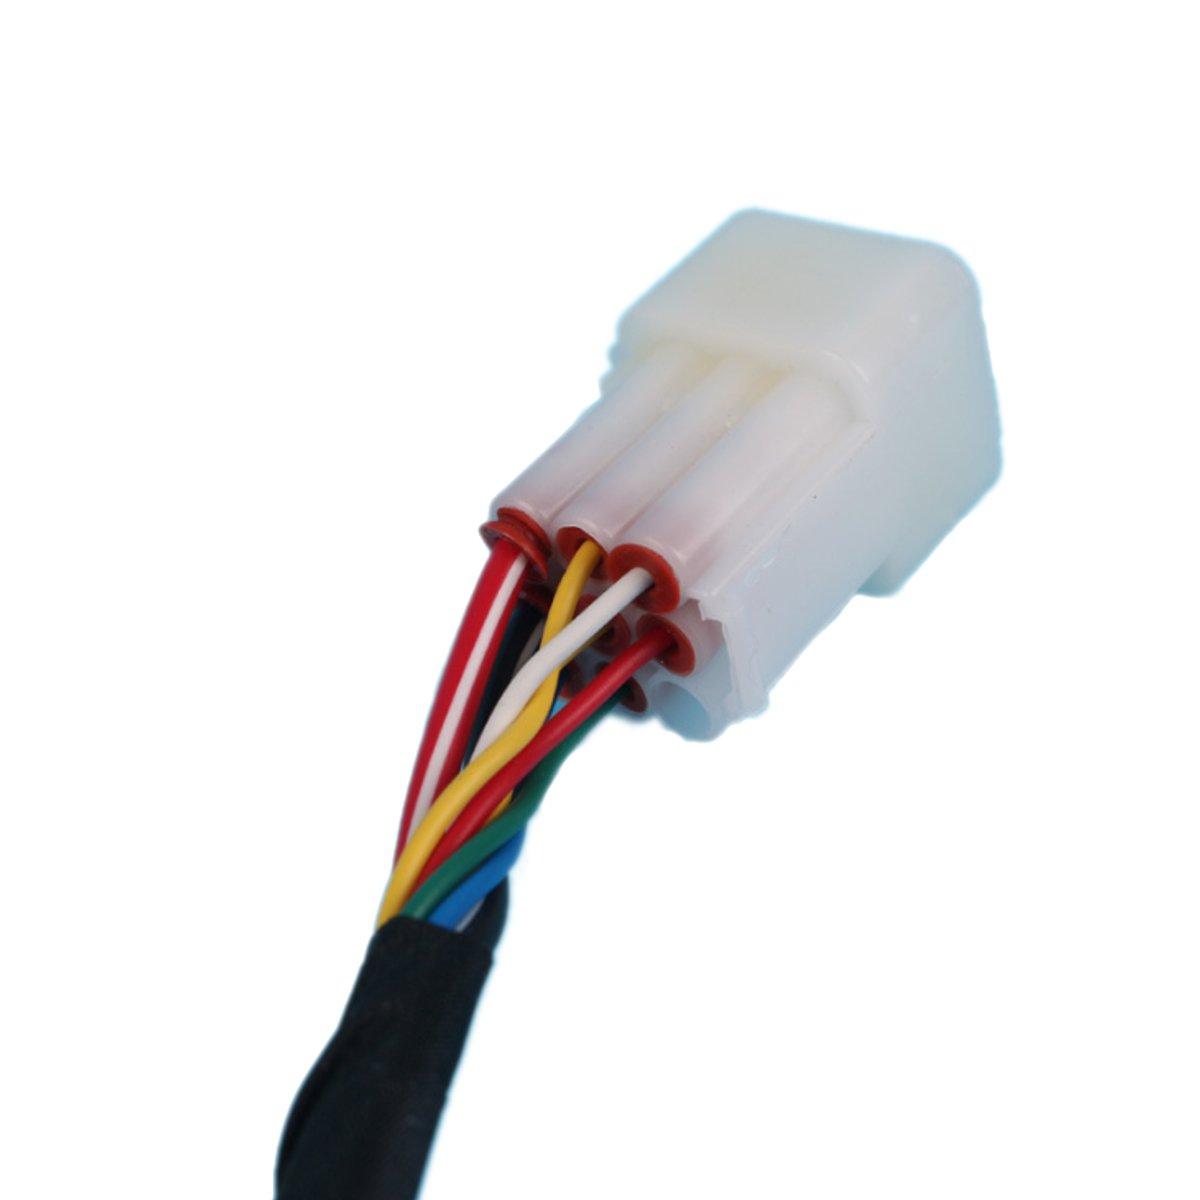 12V 24V 5KW Car Heater Main Board Control Board Parking Heater Accessories